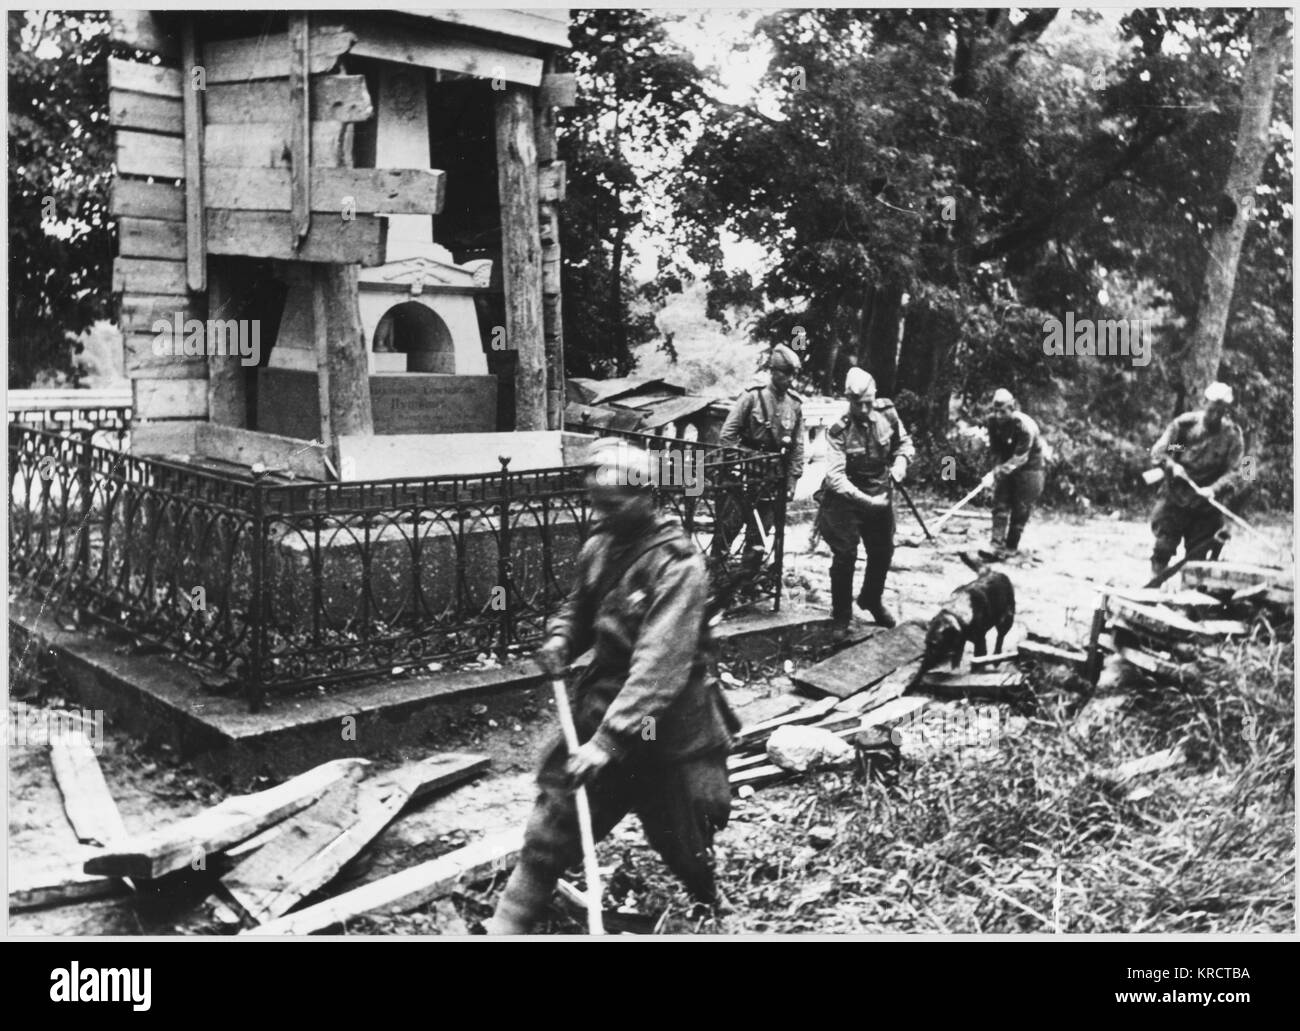 Soviet bomb disposal team check area around Pushkin's Grave. Date: 1942 - 1945 - Stock Image